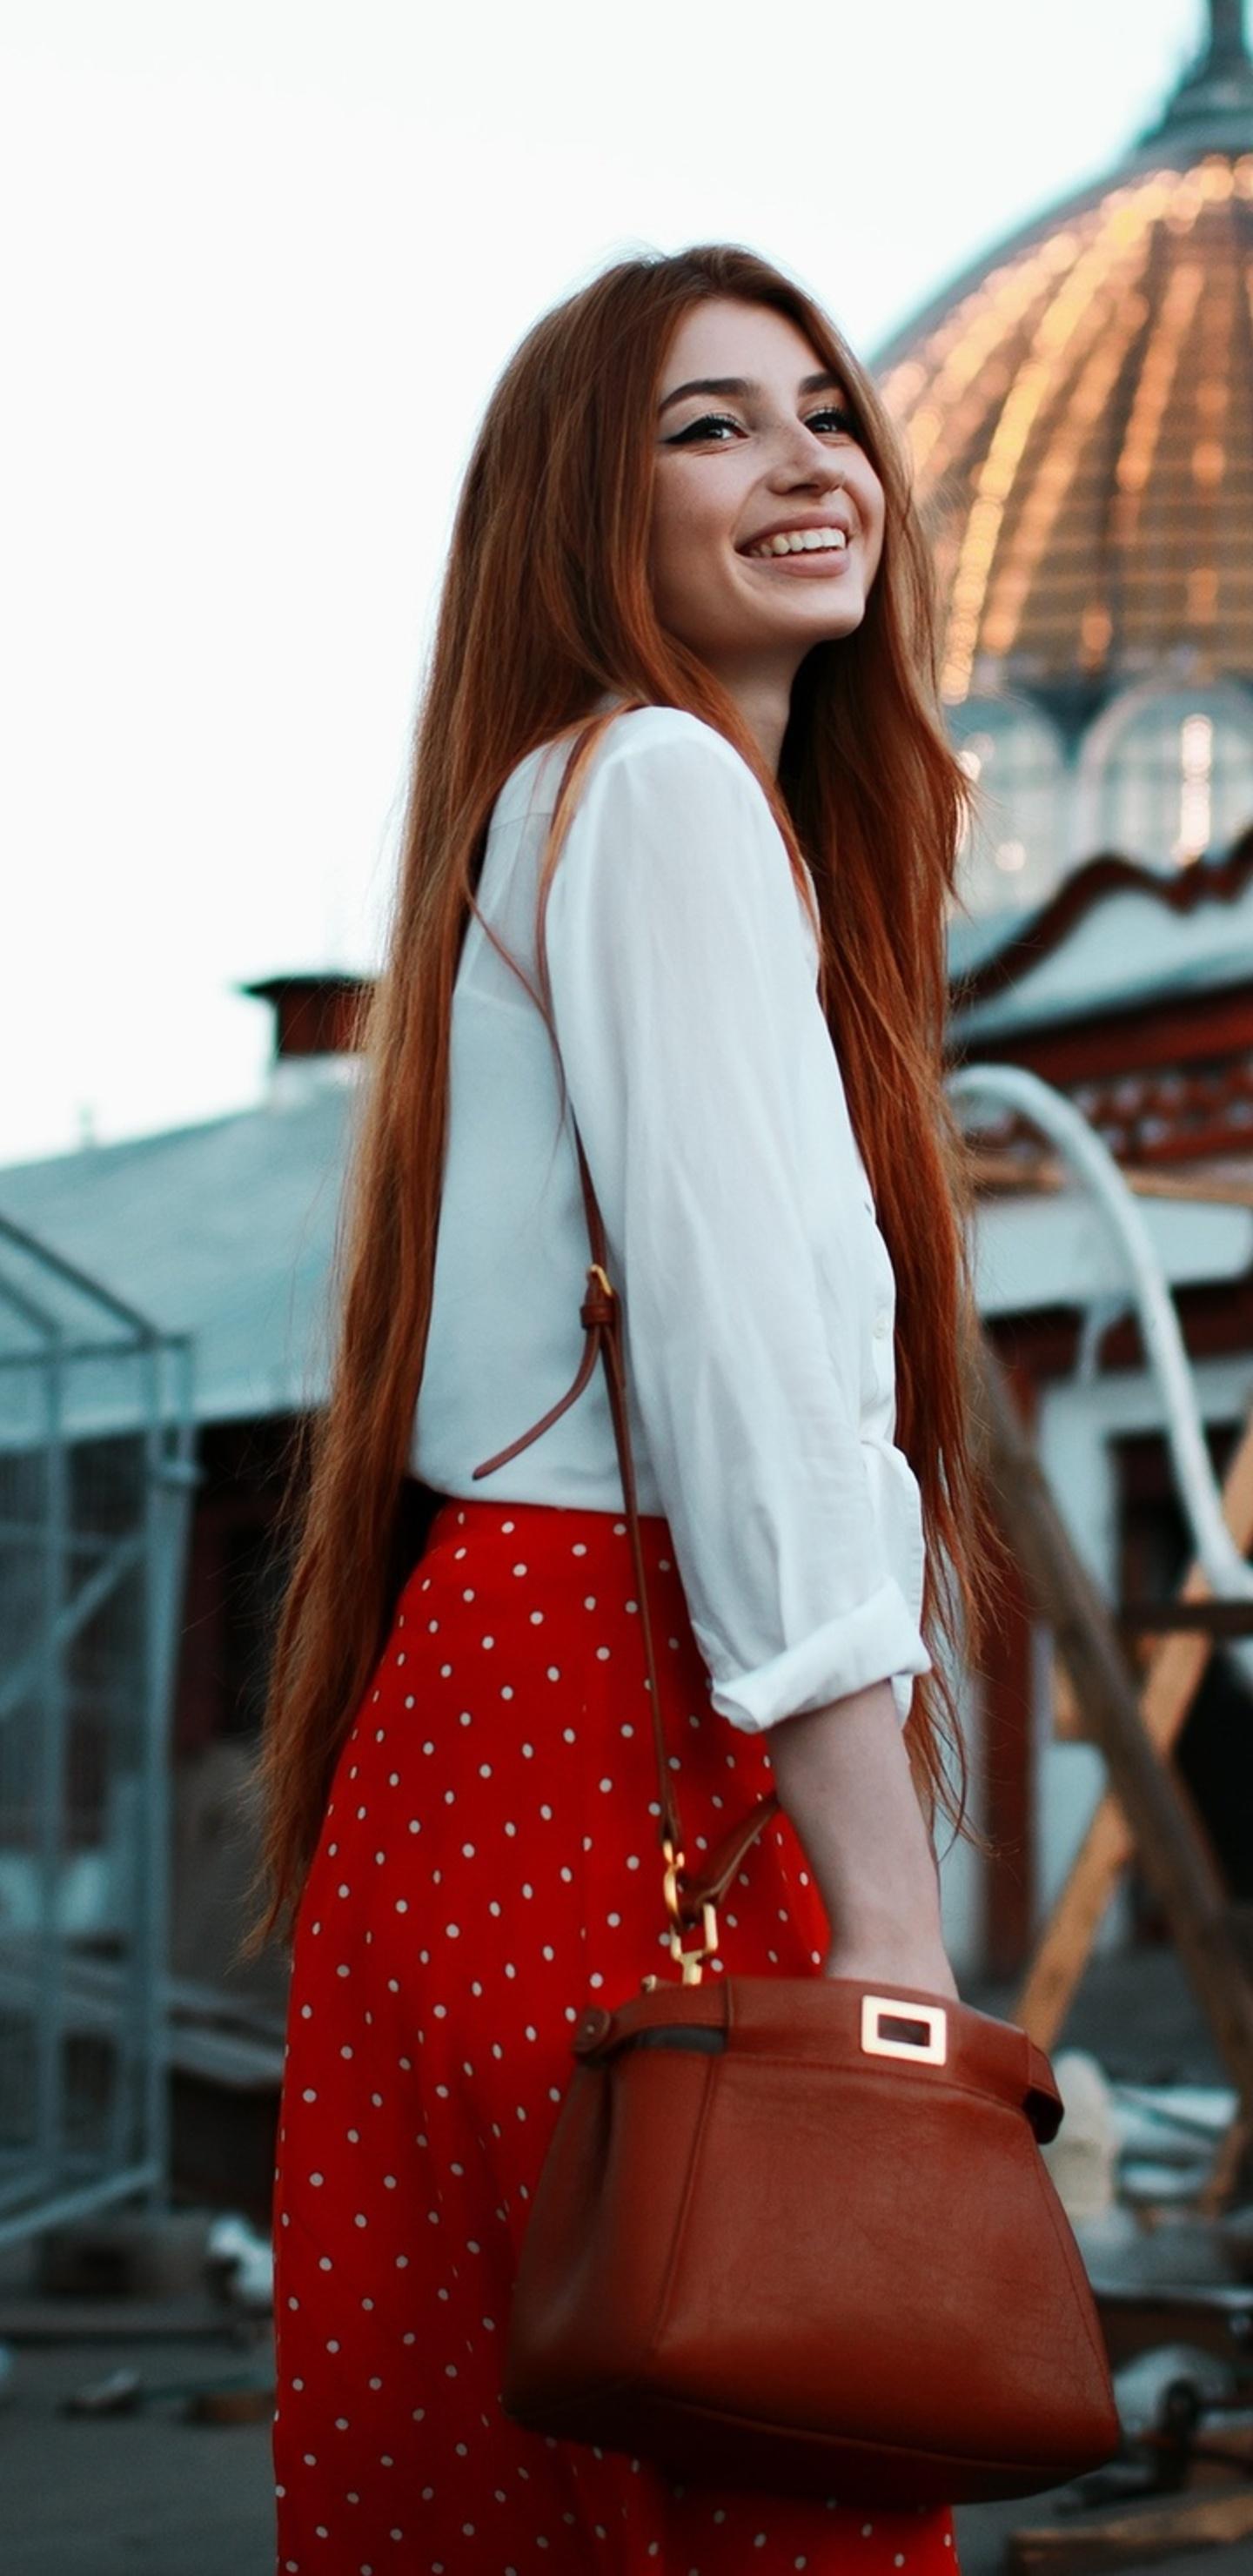 red-head-girl-smiling-uh.jpg